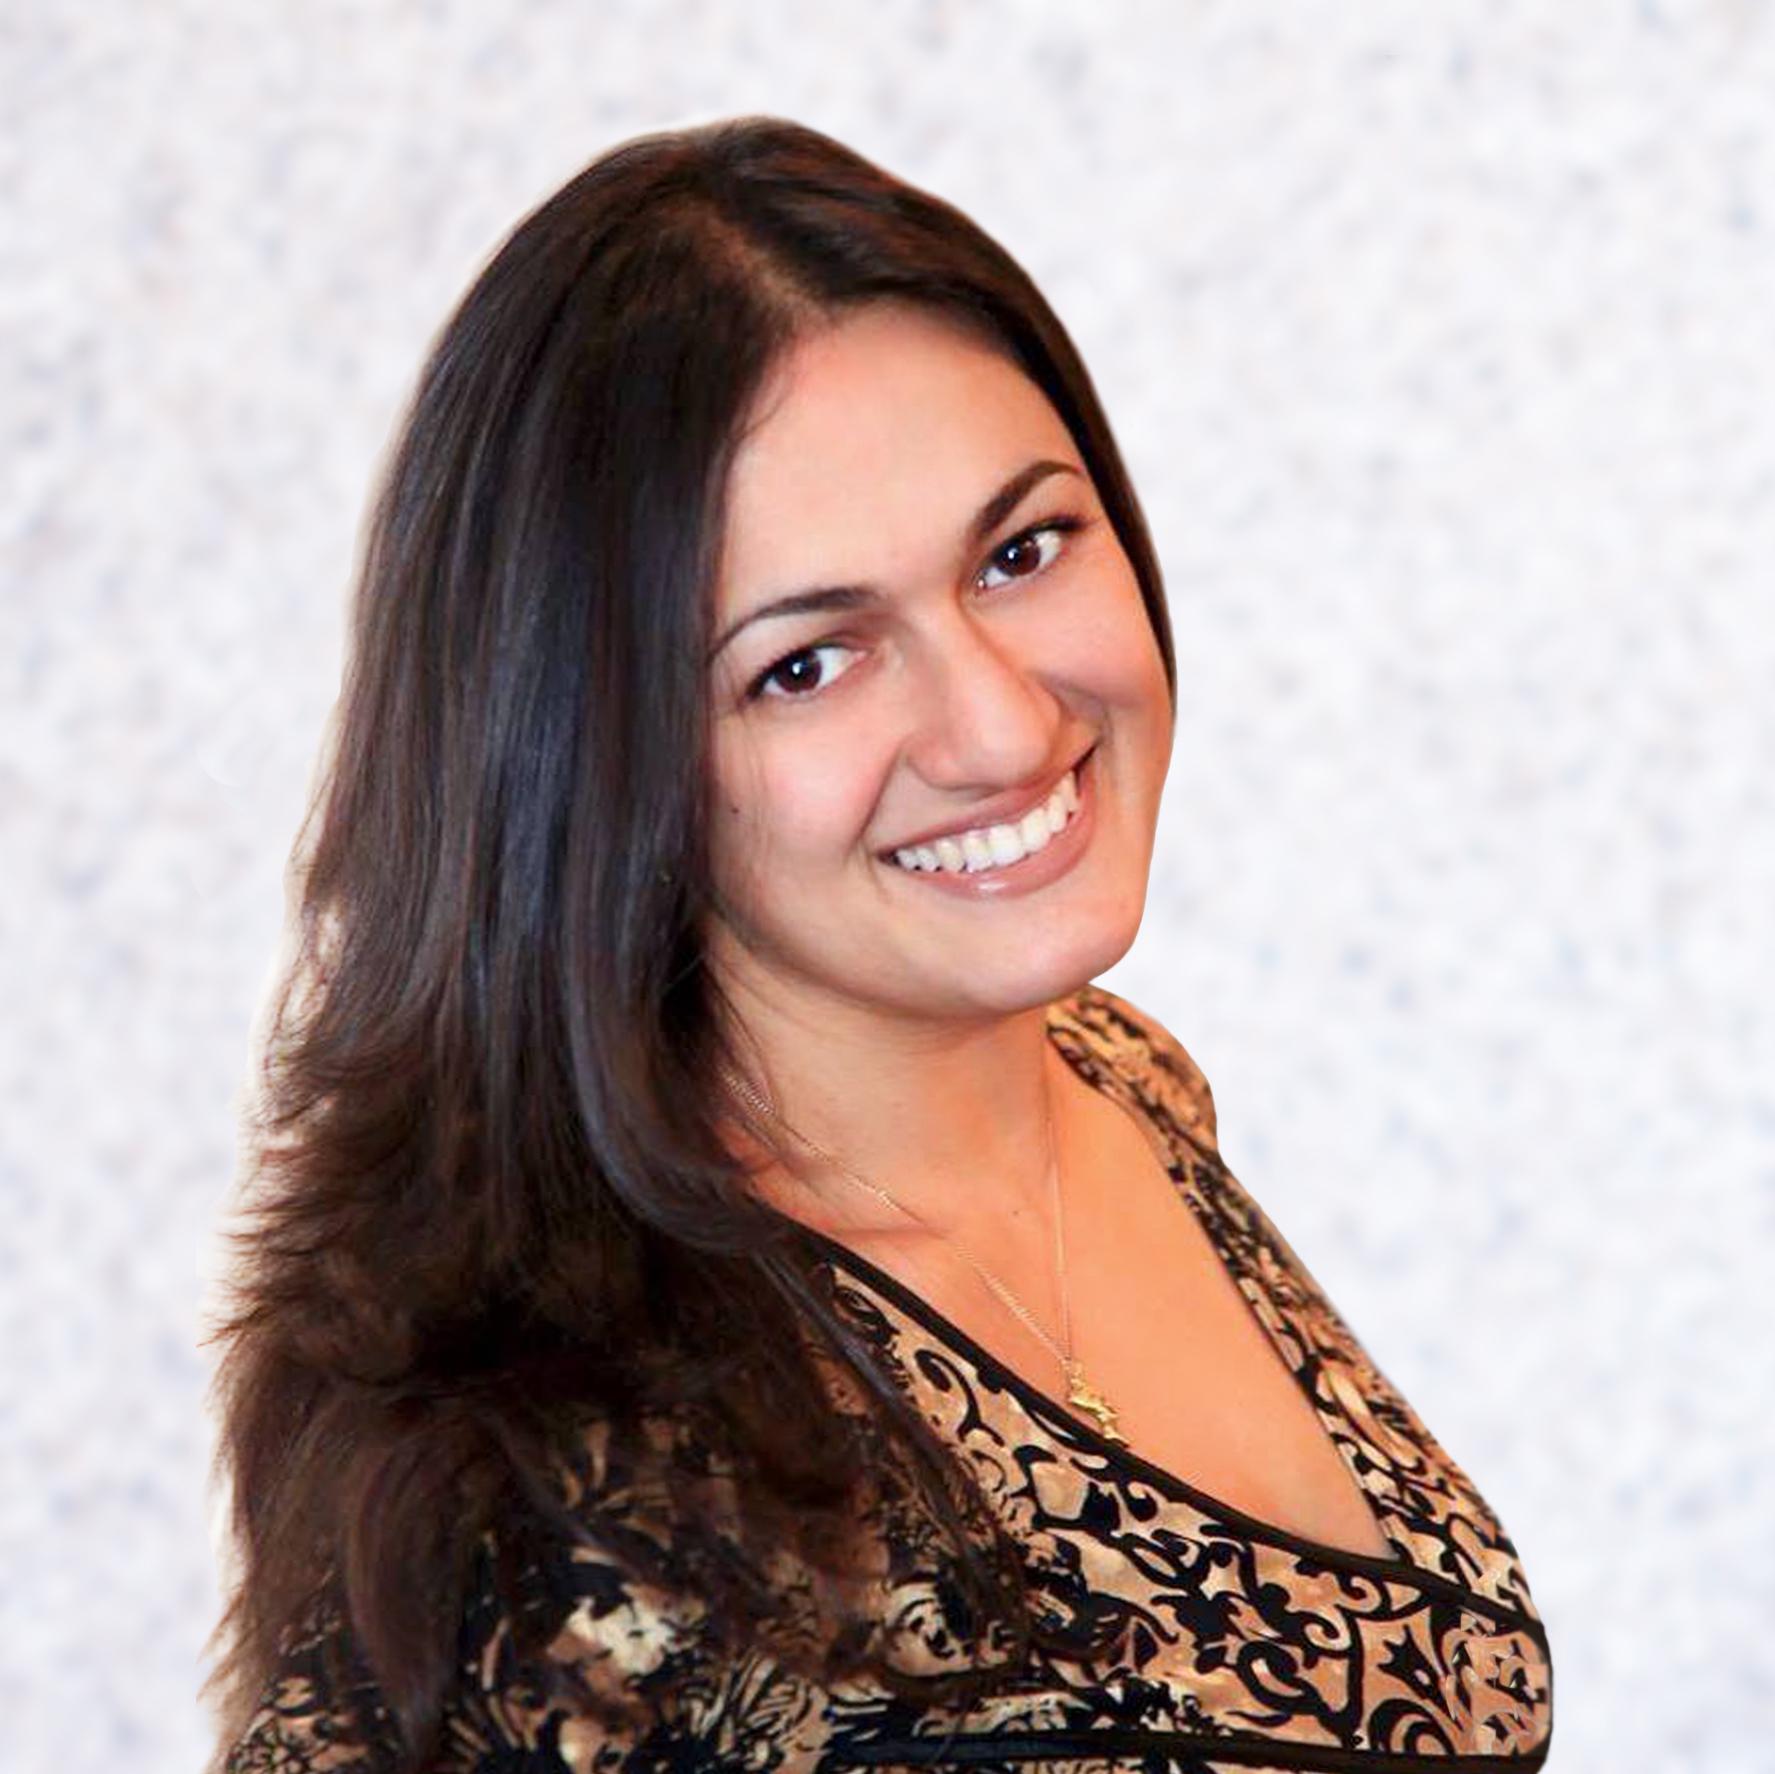 Diana Ayvazyan